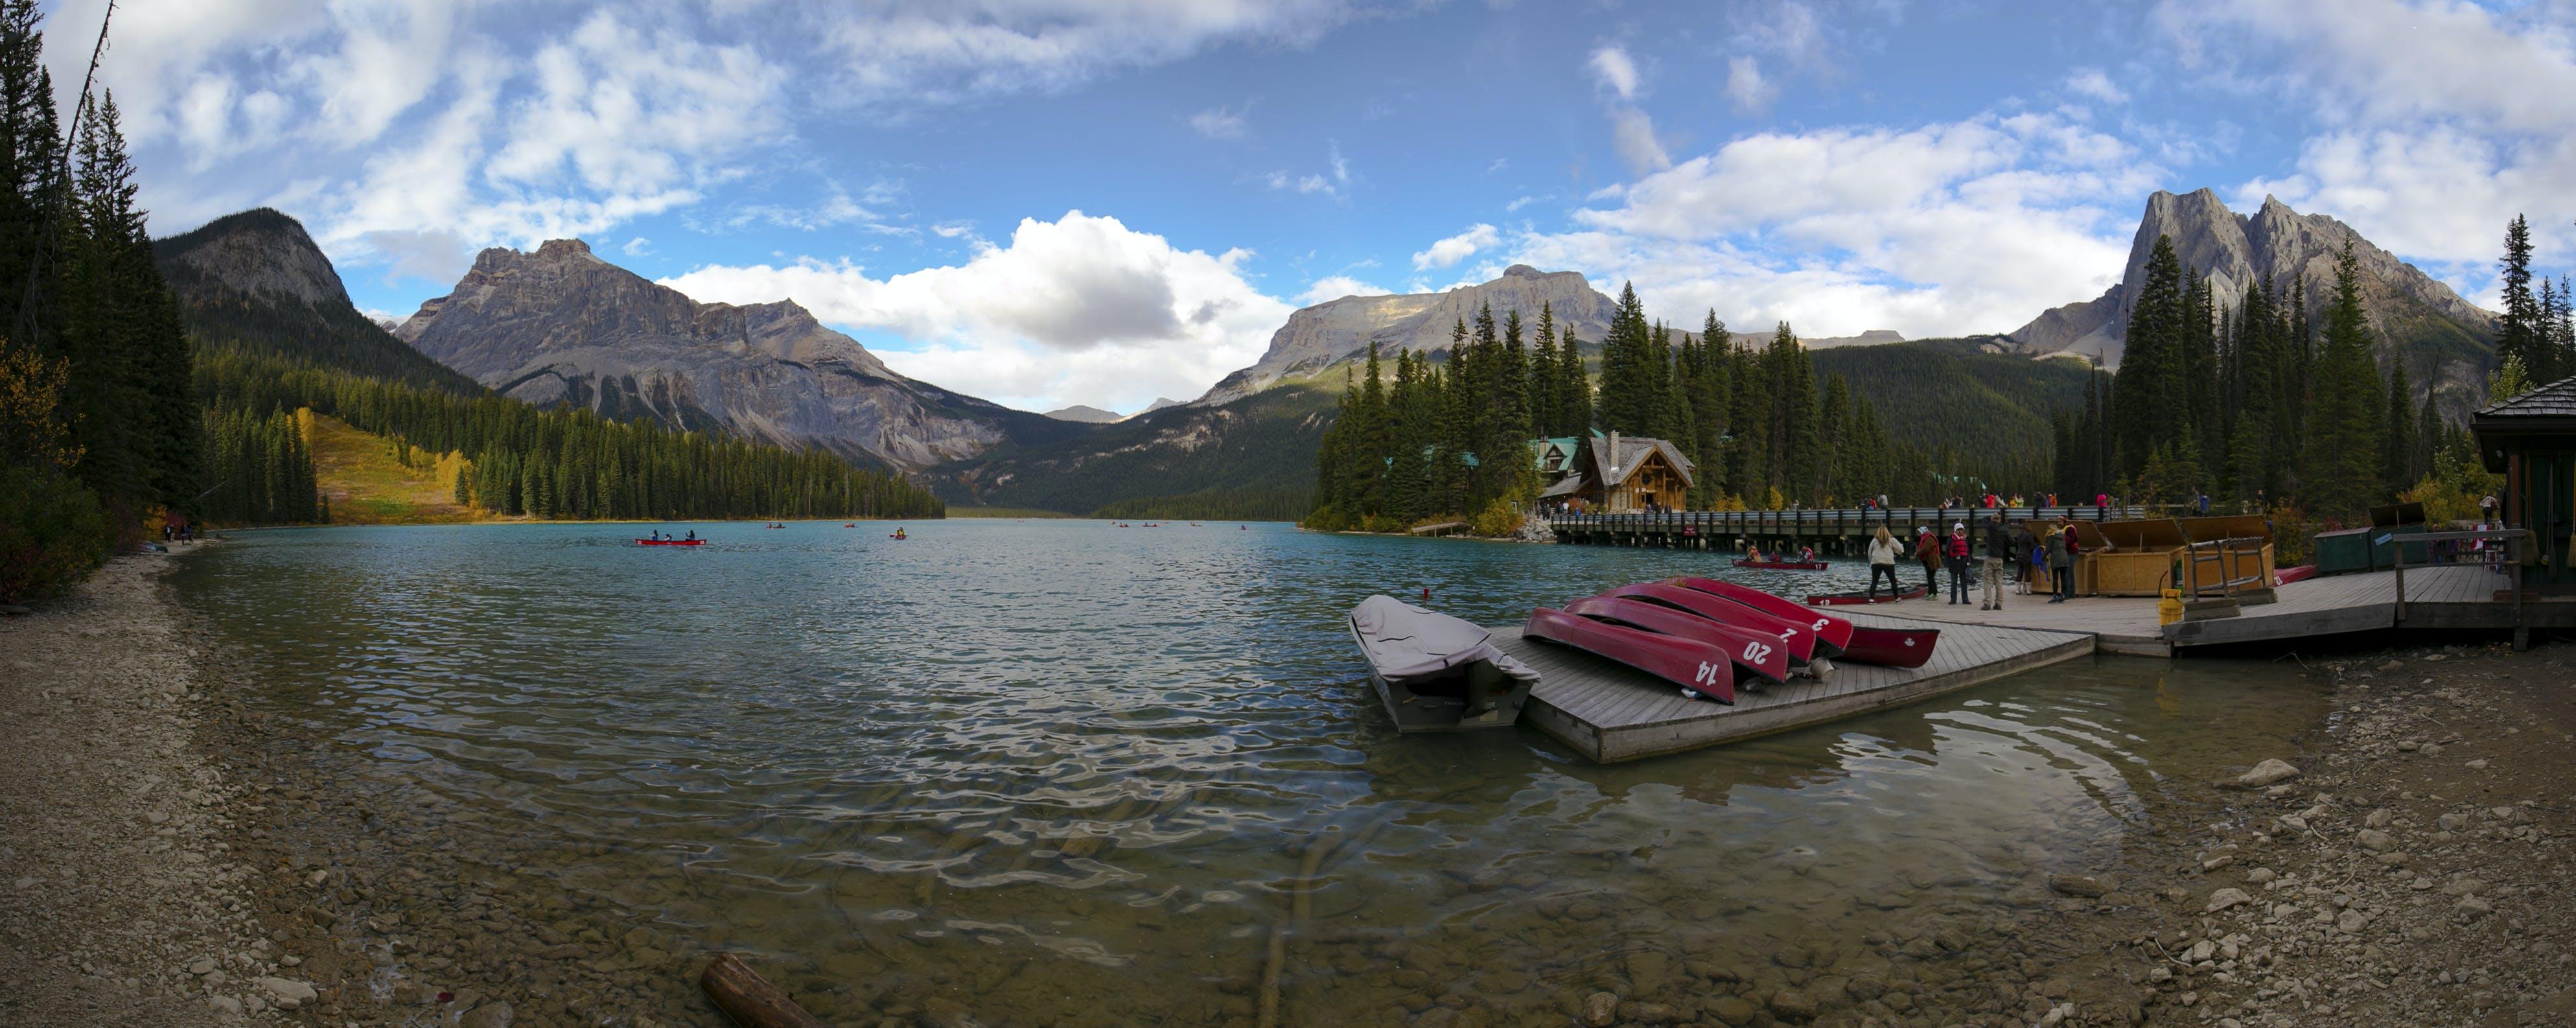 Free stock photo of canada, british columbia, emerald lake